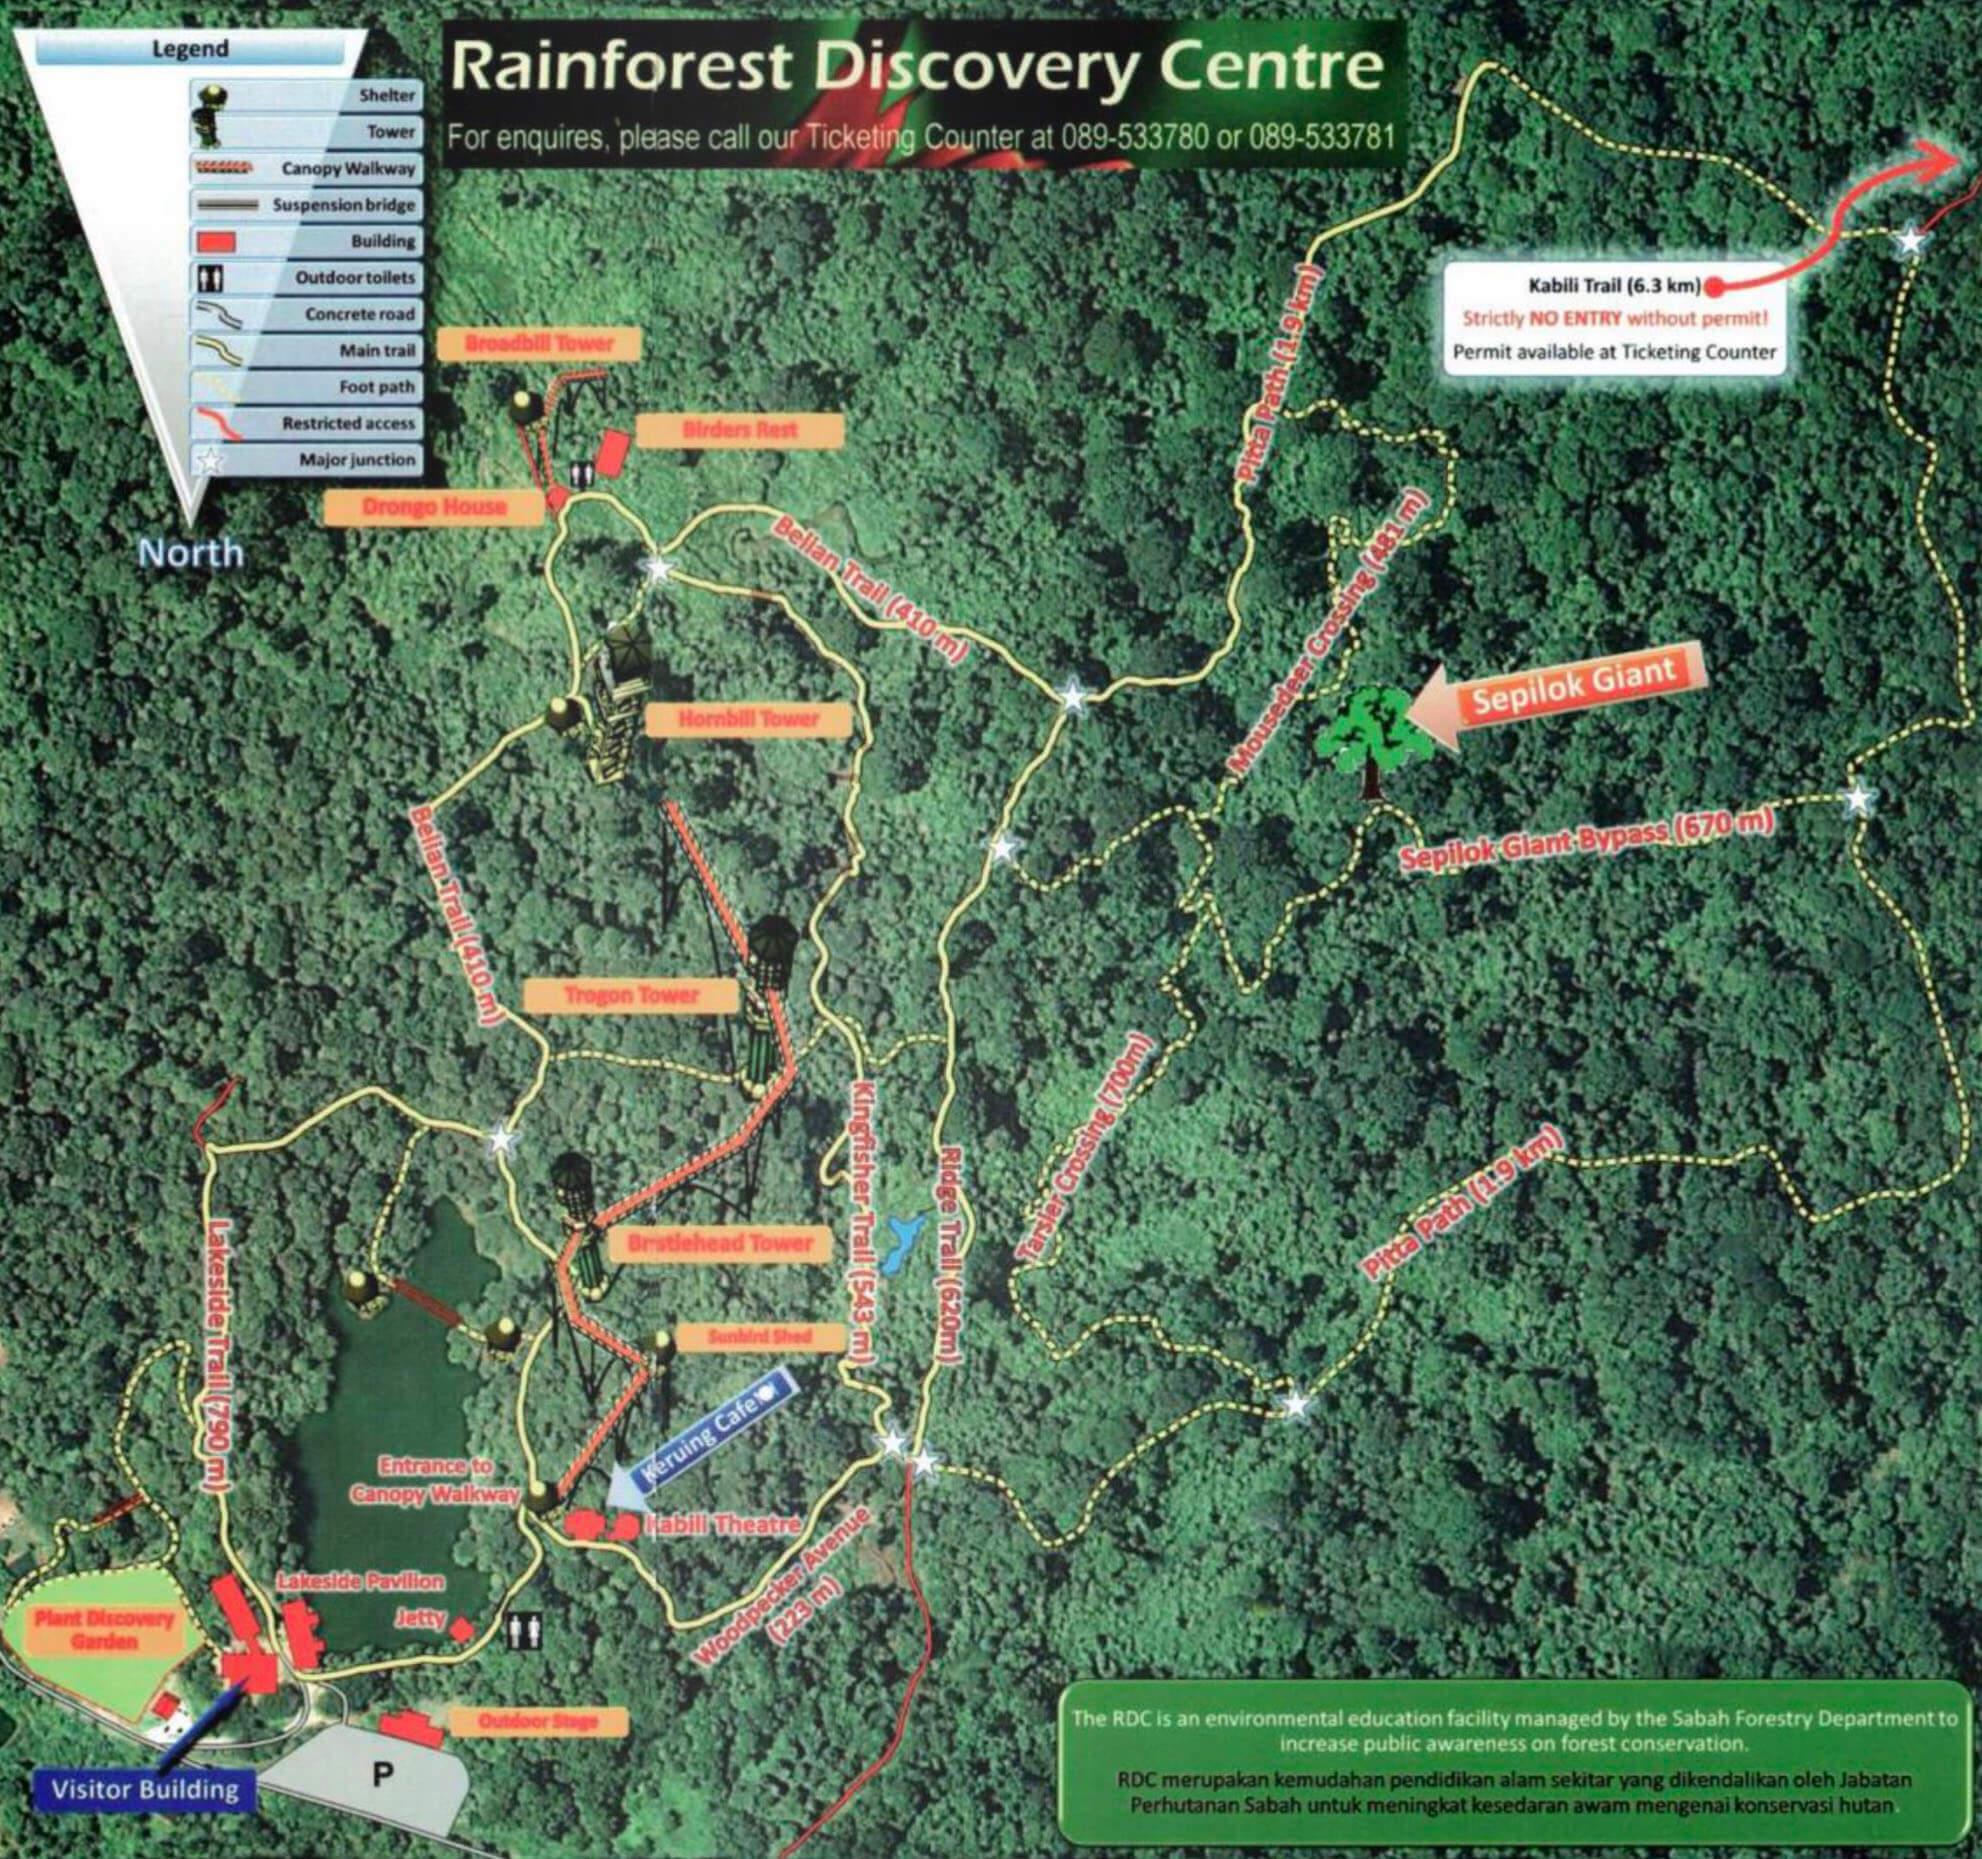 Karte des Rainforest Discovery Centres in Sepilok